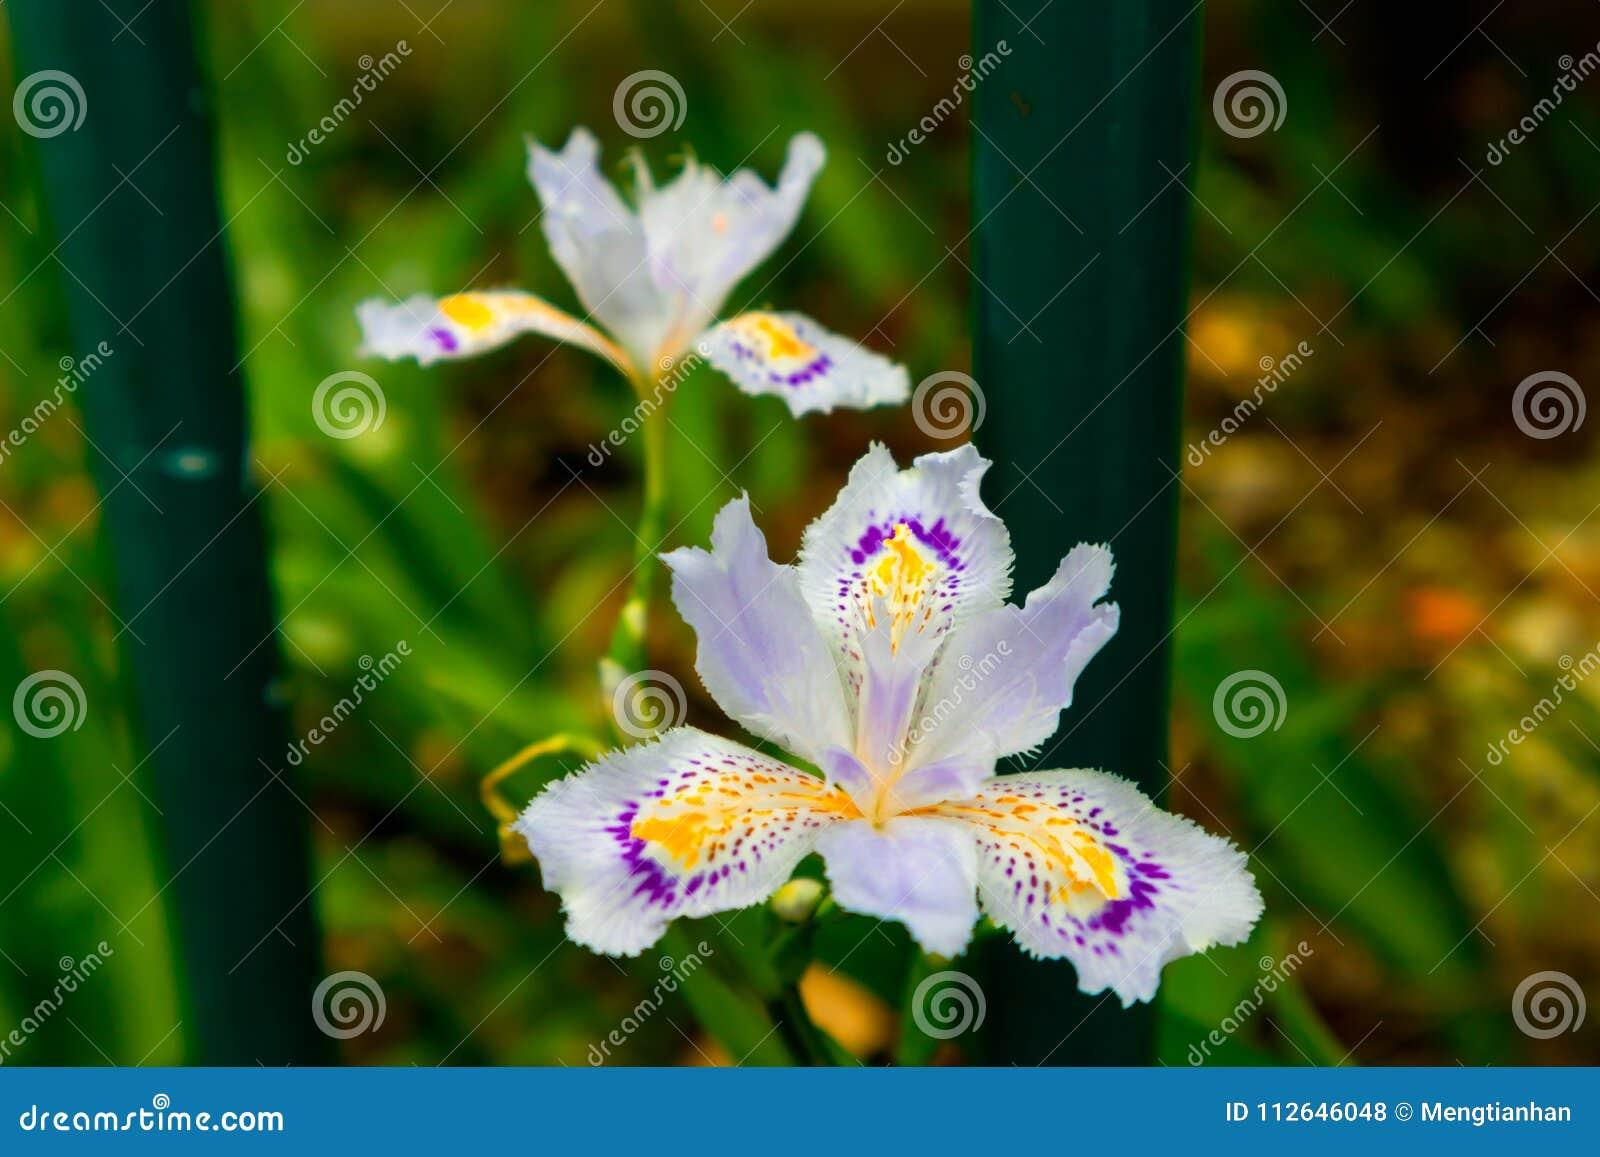 Iris Flower Perennial Herb Stock Photo Image Of Fleshy 112646048